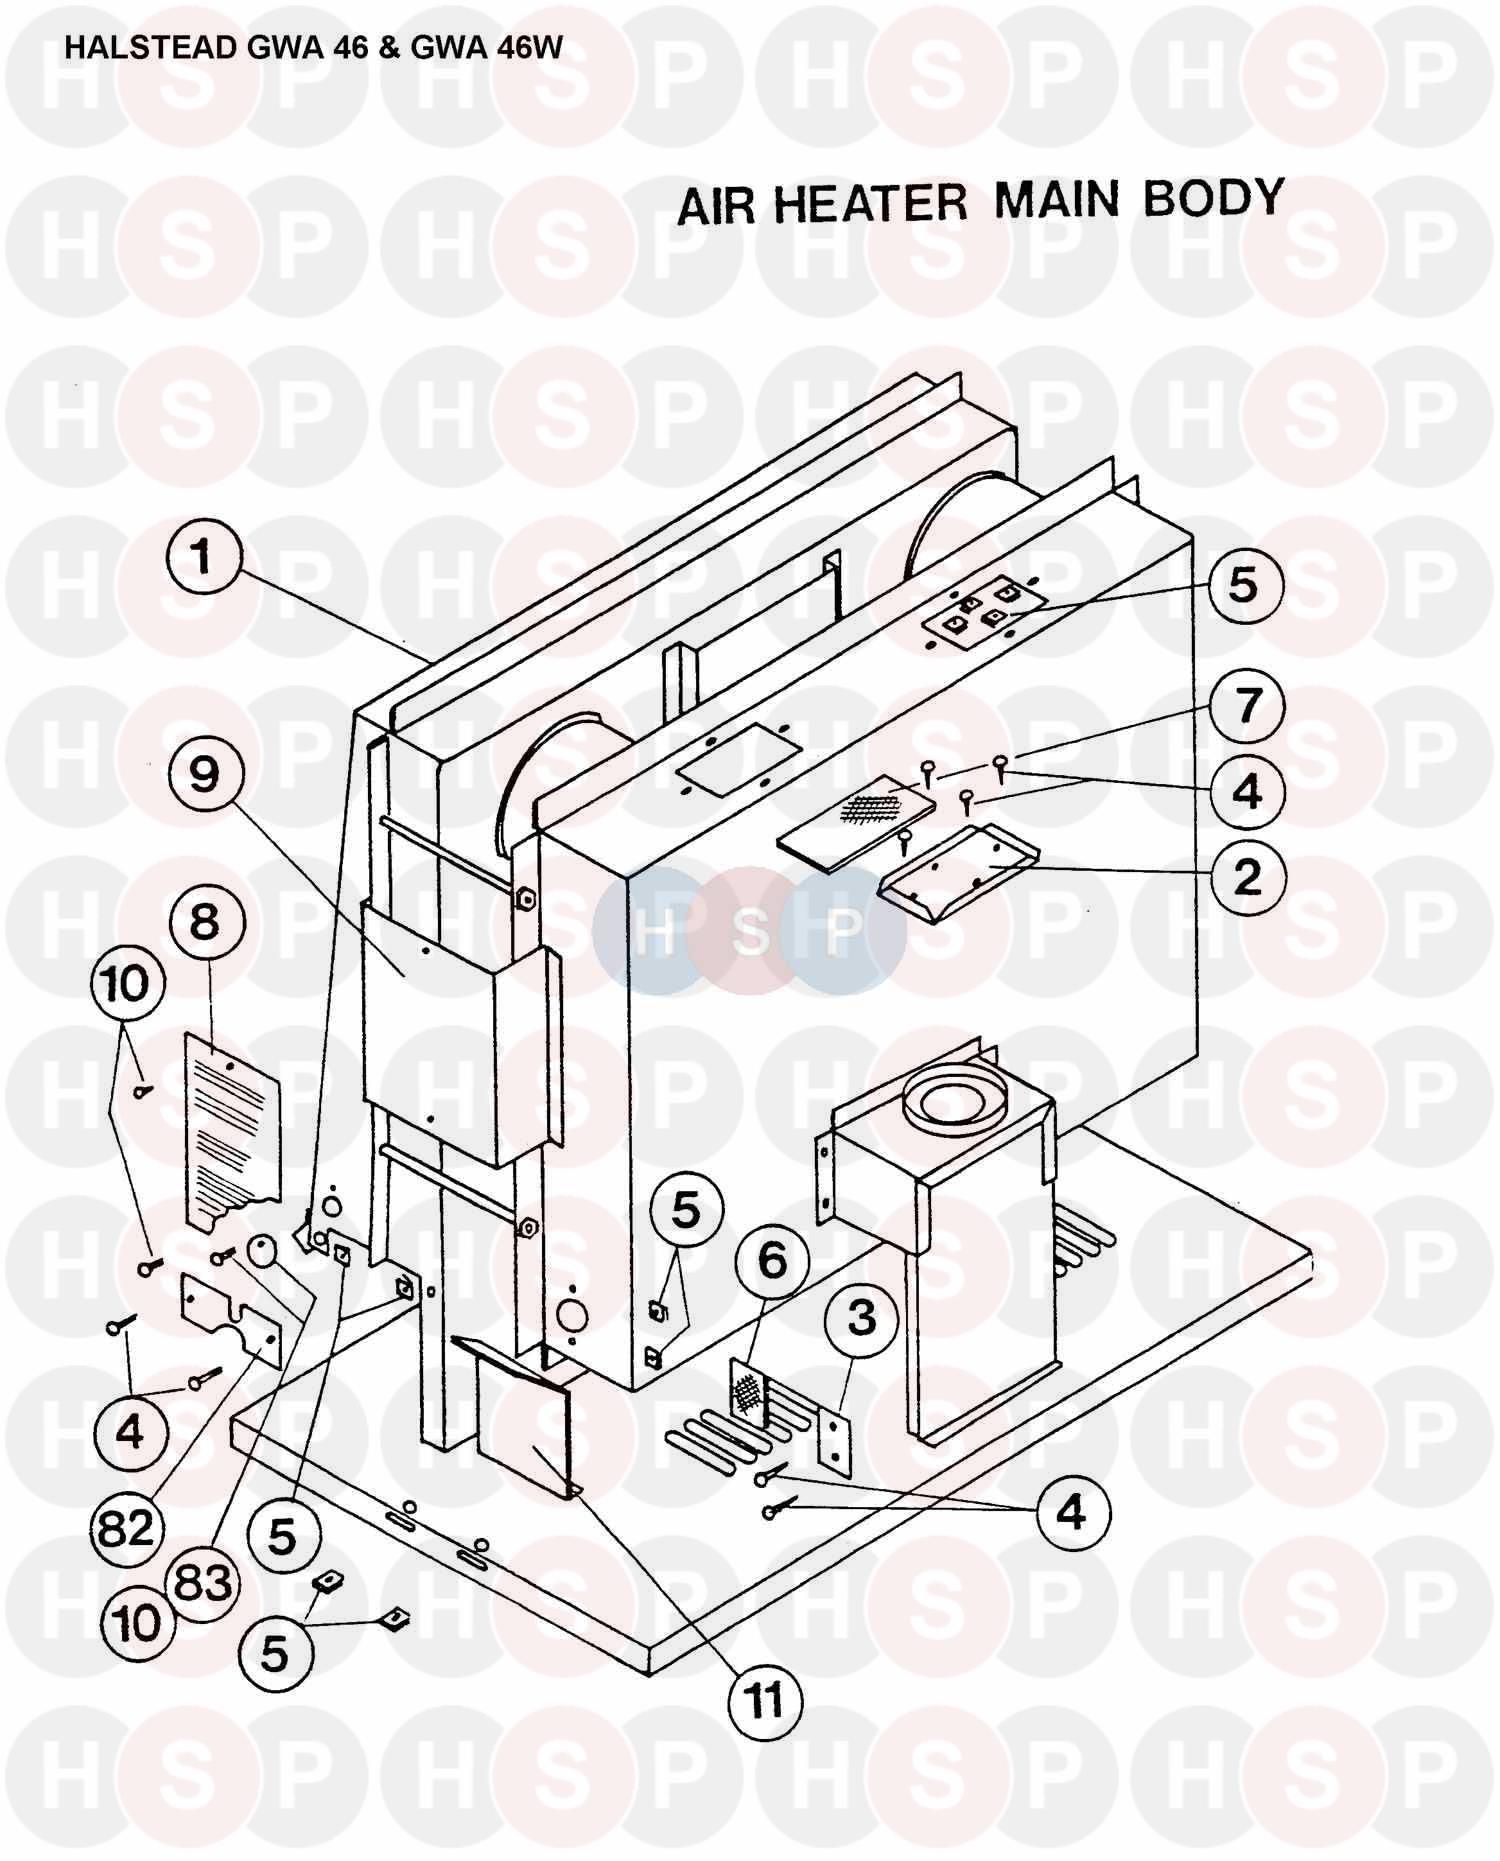 halstead gwa 46w appliance diagram air heater heating. Black Bedroom Furniture Sets. Home Design Ideas